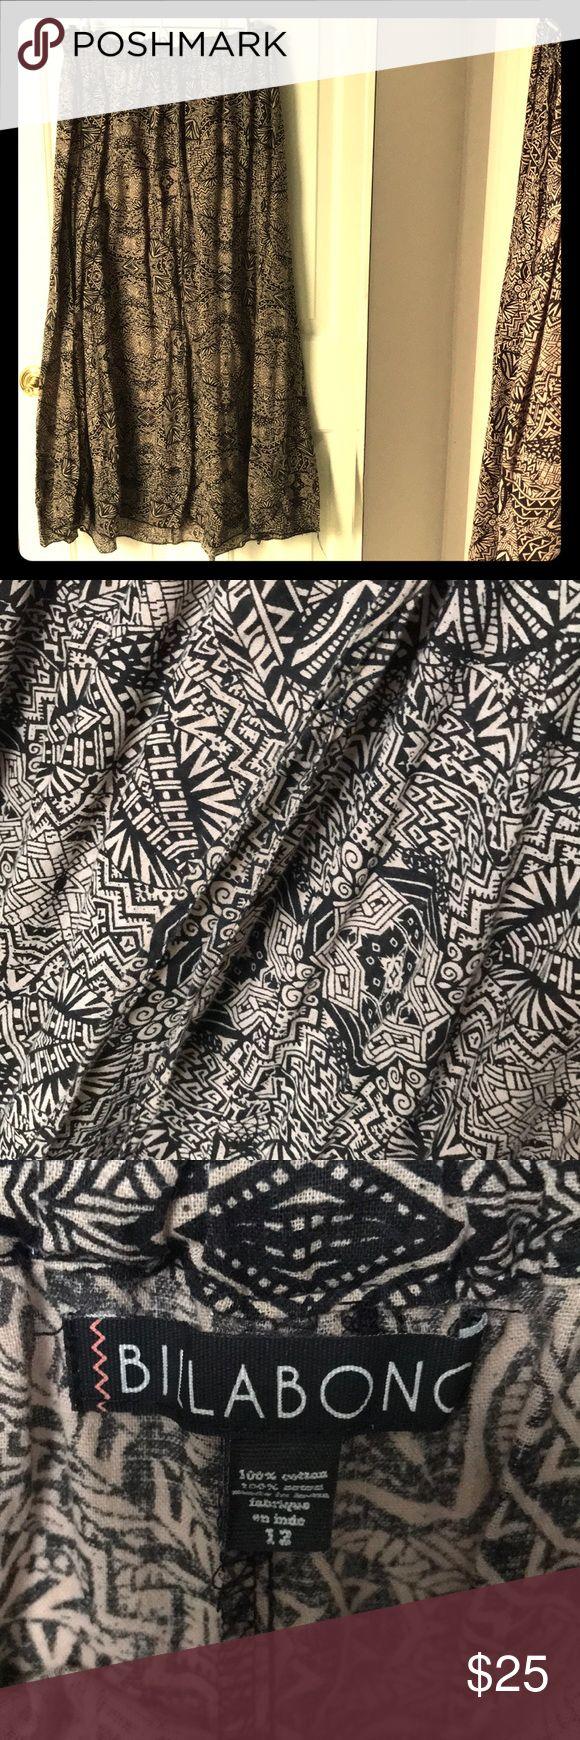 Billabong Skirt Billabong Skirt , size 12, bought in Singapore, super comfortable, cotton, breezy, maxi skirt! Love for summer and hot weather! Stretch on top... Billabong Skirts Maxi